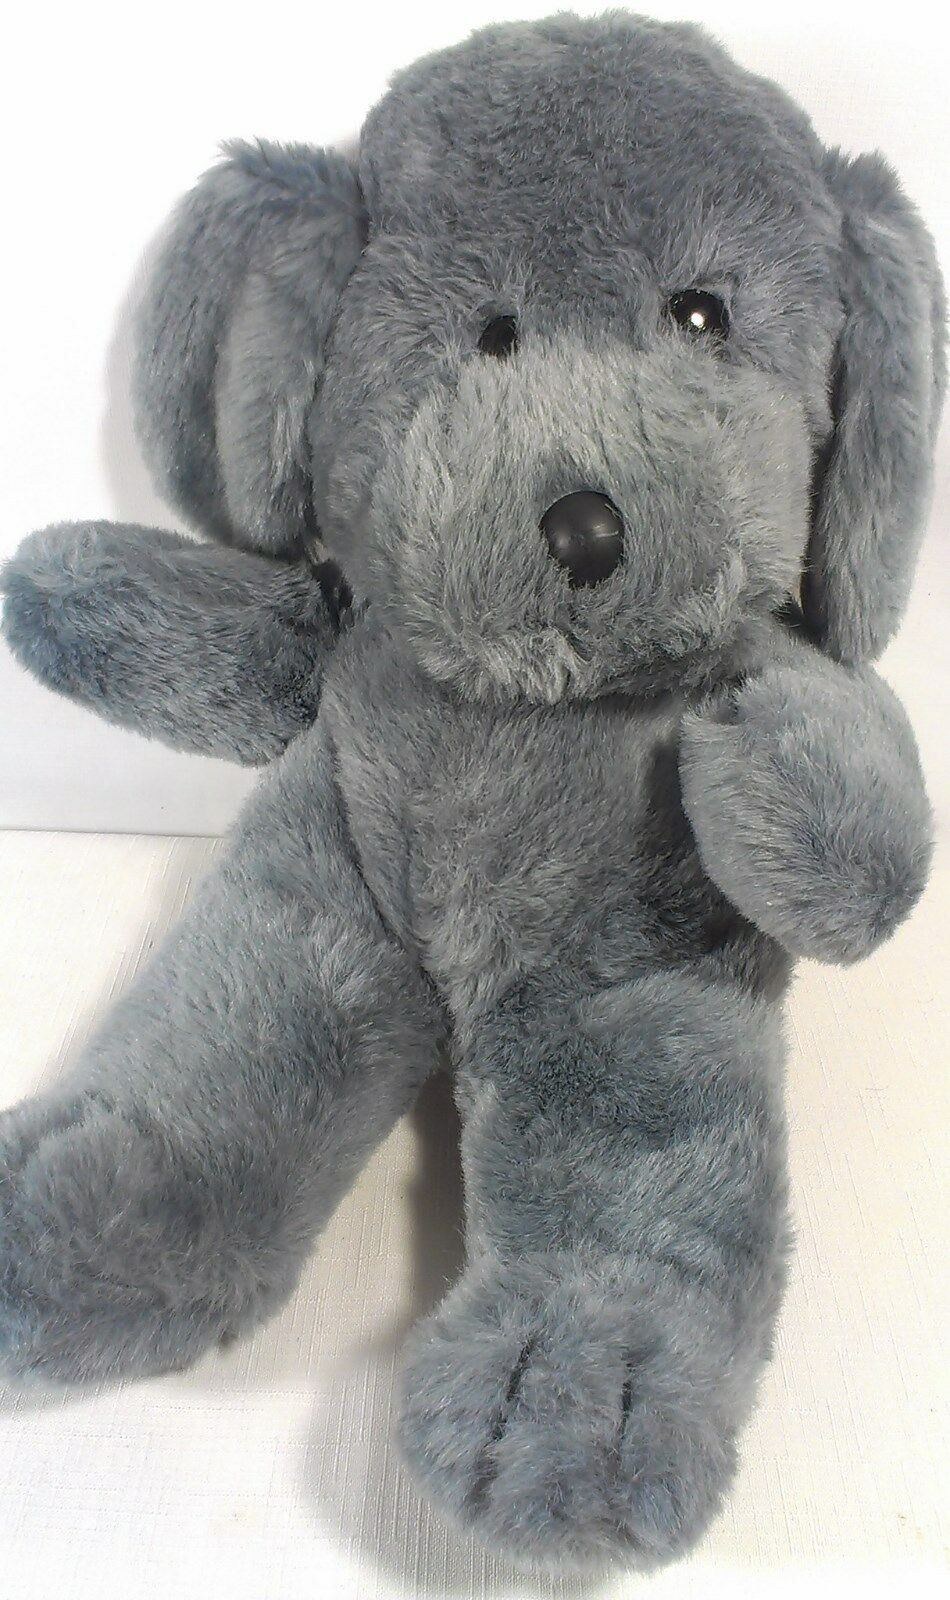 Woolworths Rare Vintage Dog Plush Smoky grau Stuffed Animal Puppy by  MTY 16